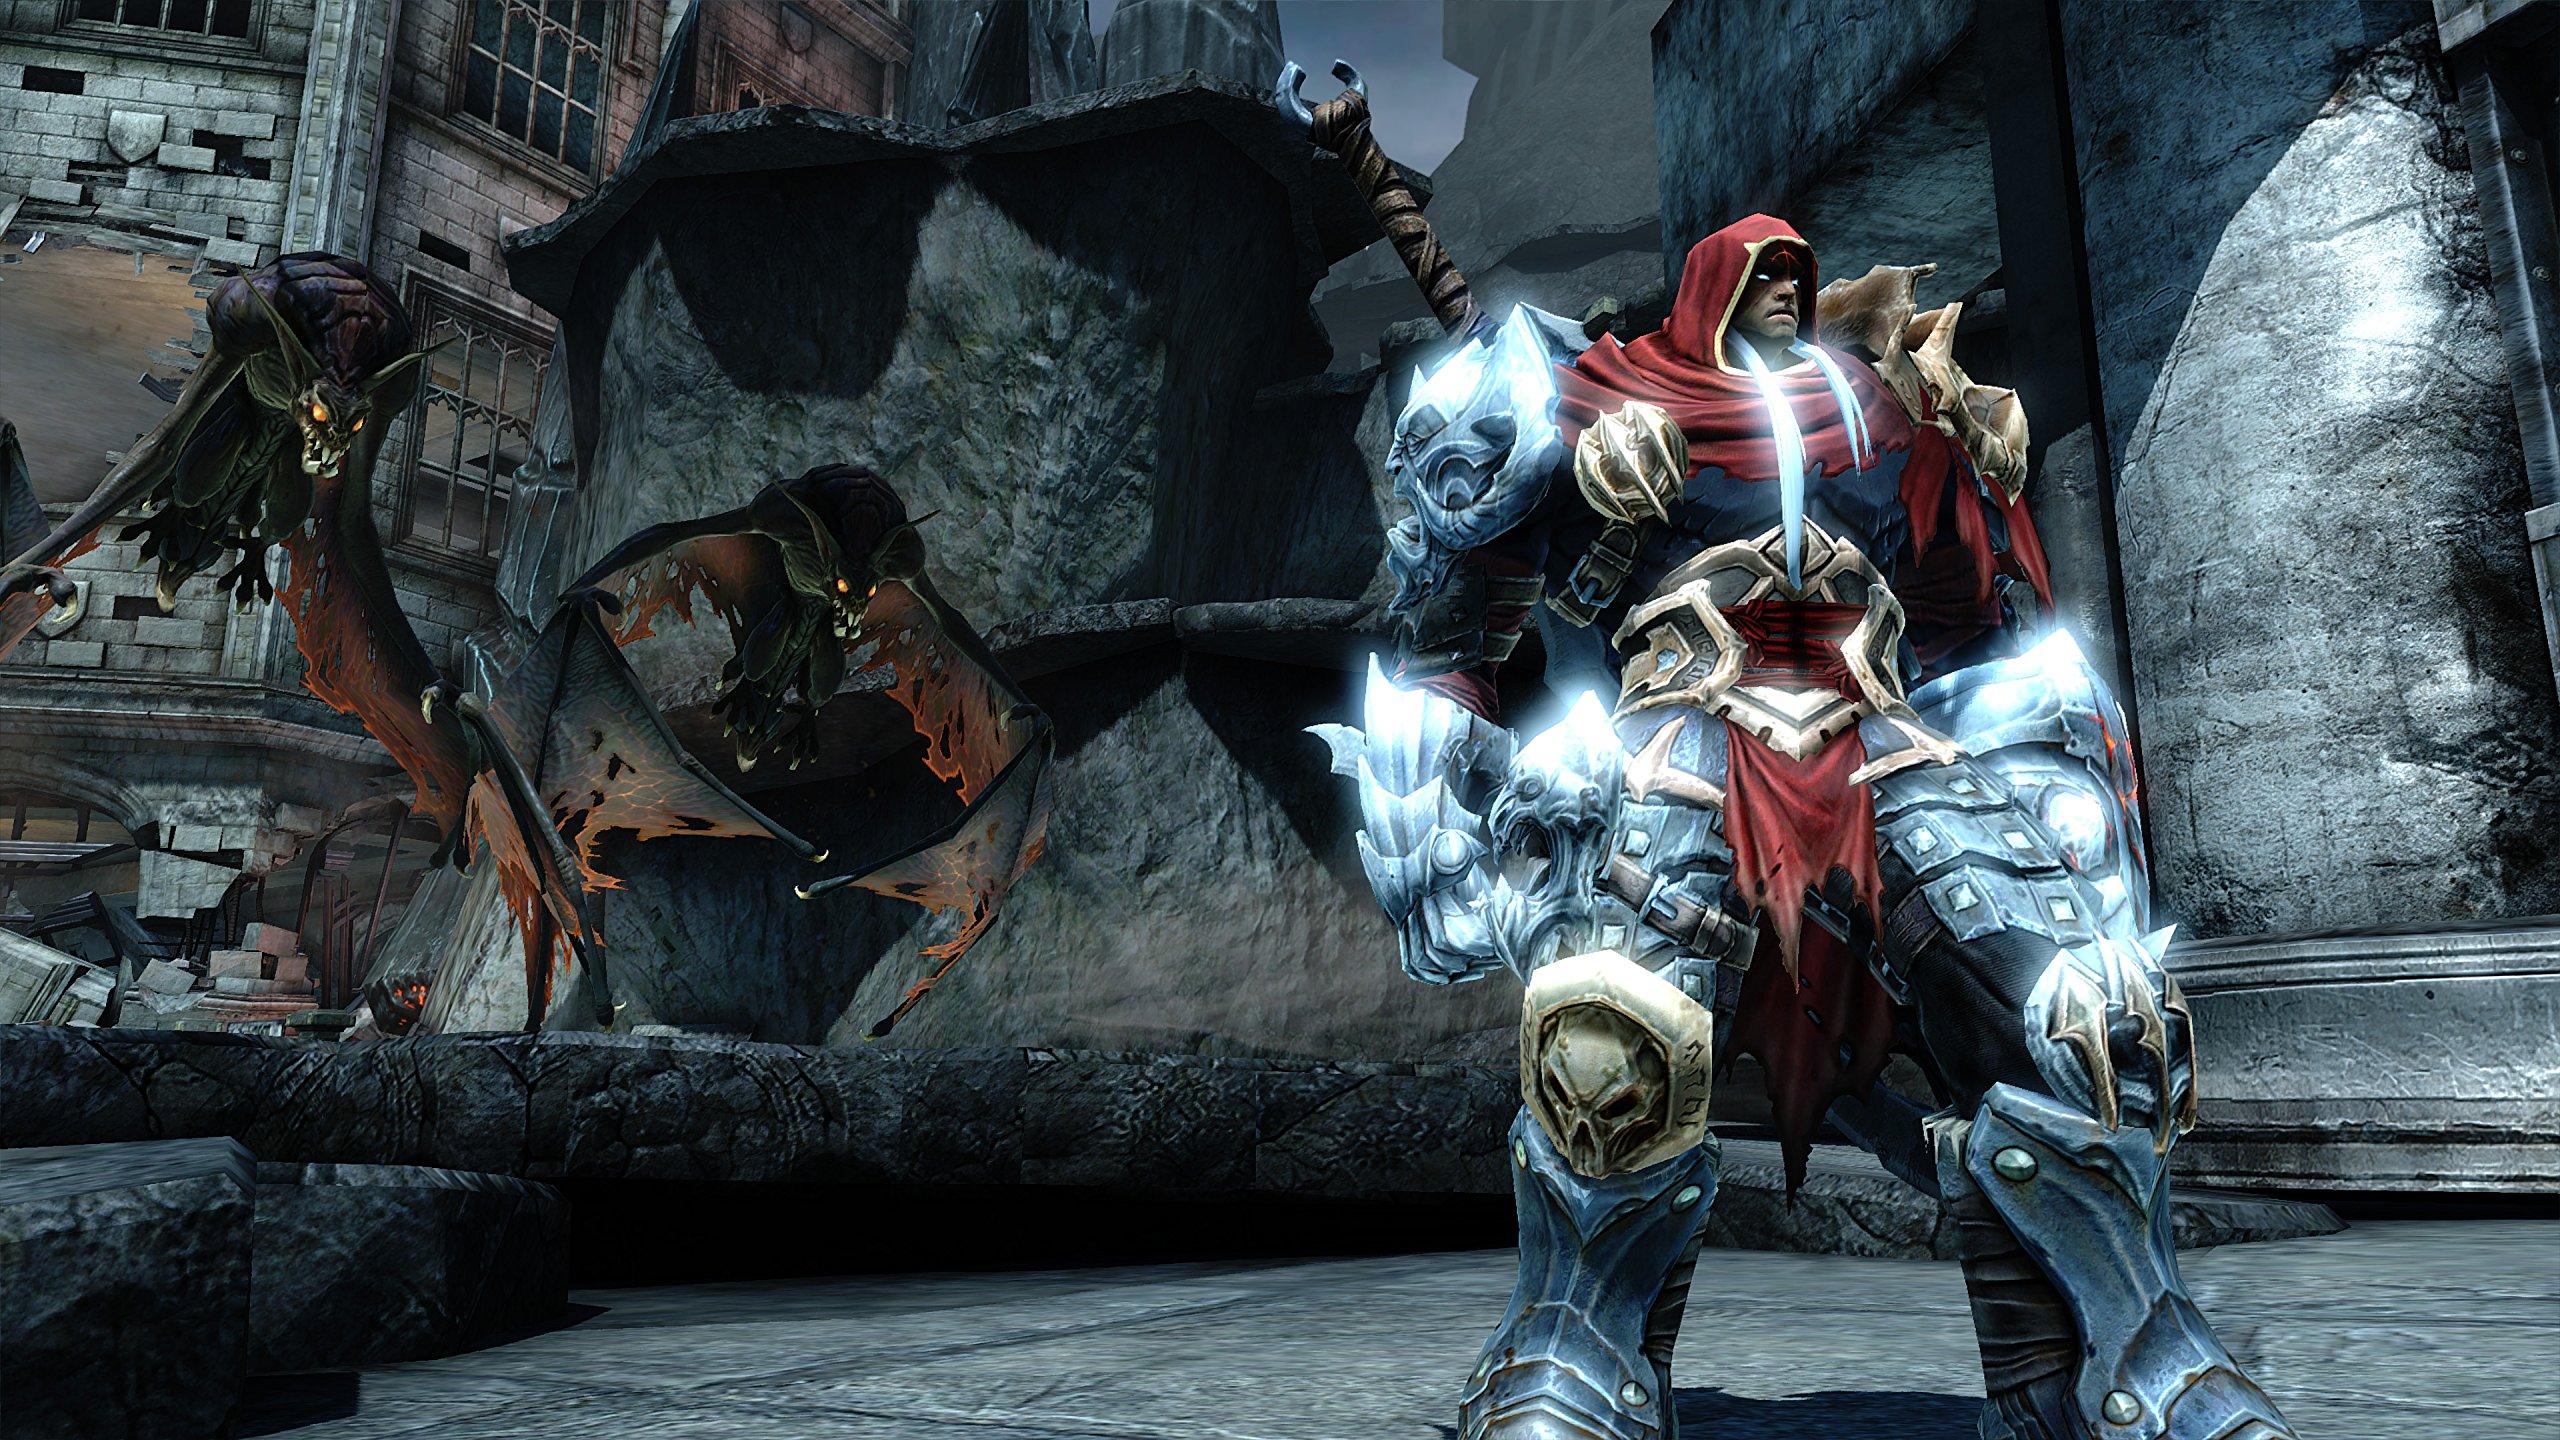 Amazon.com: Darksiders: Warmastered Edition (Wii U) - Wii U ...